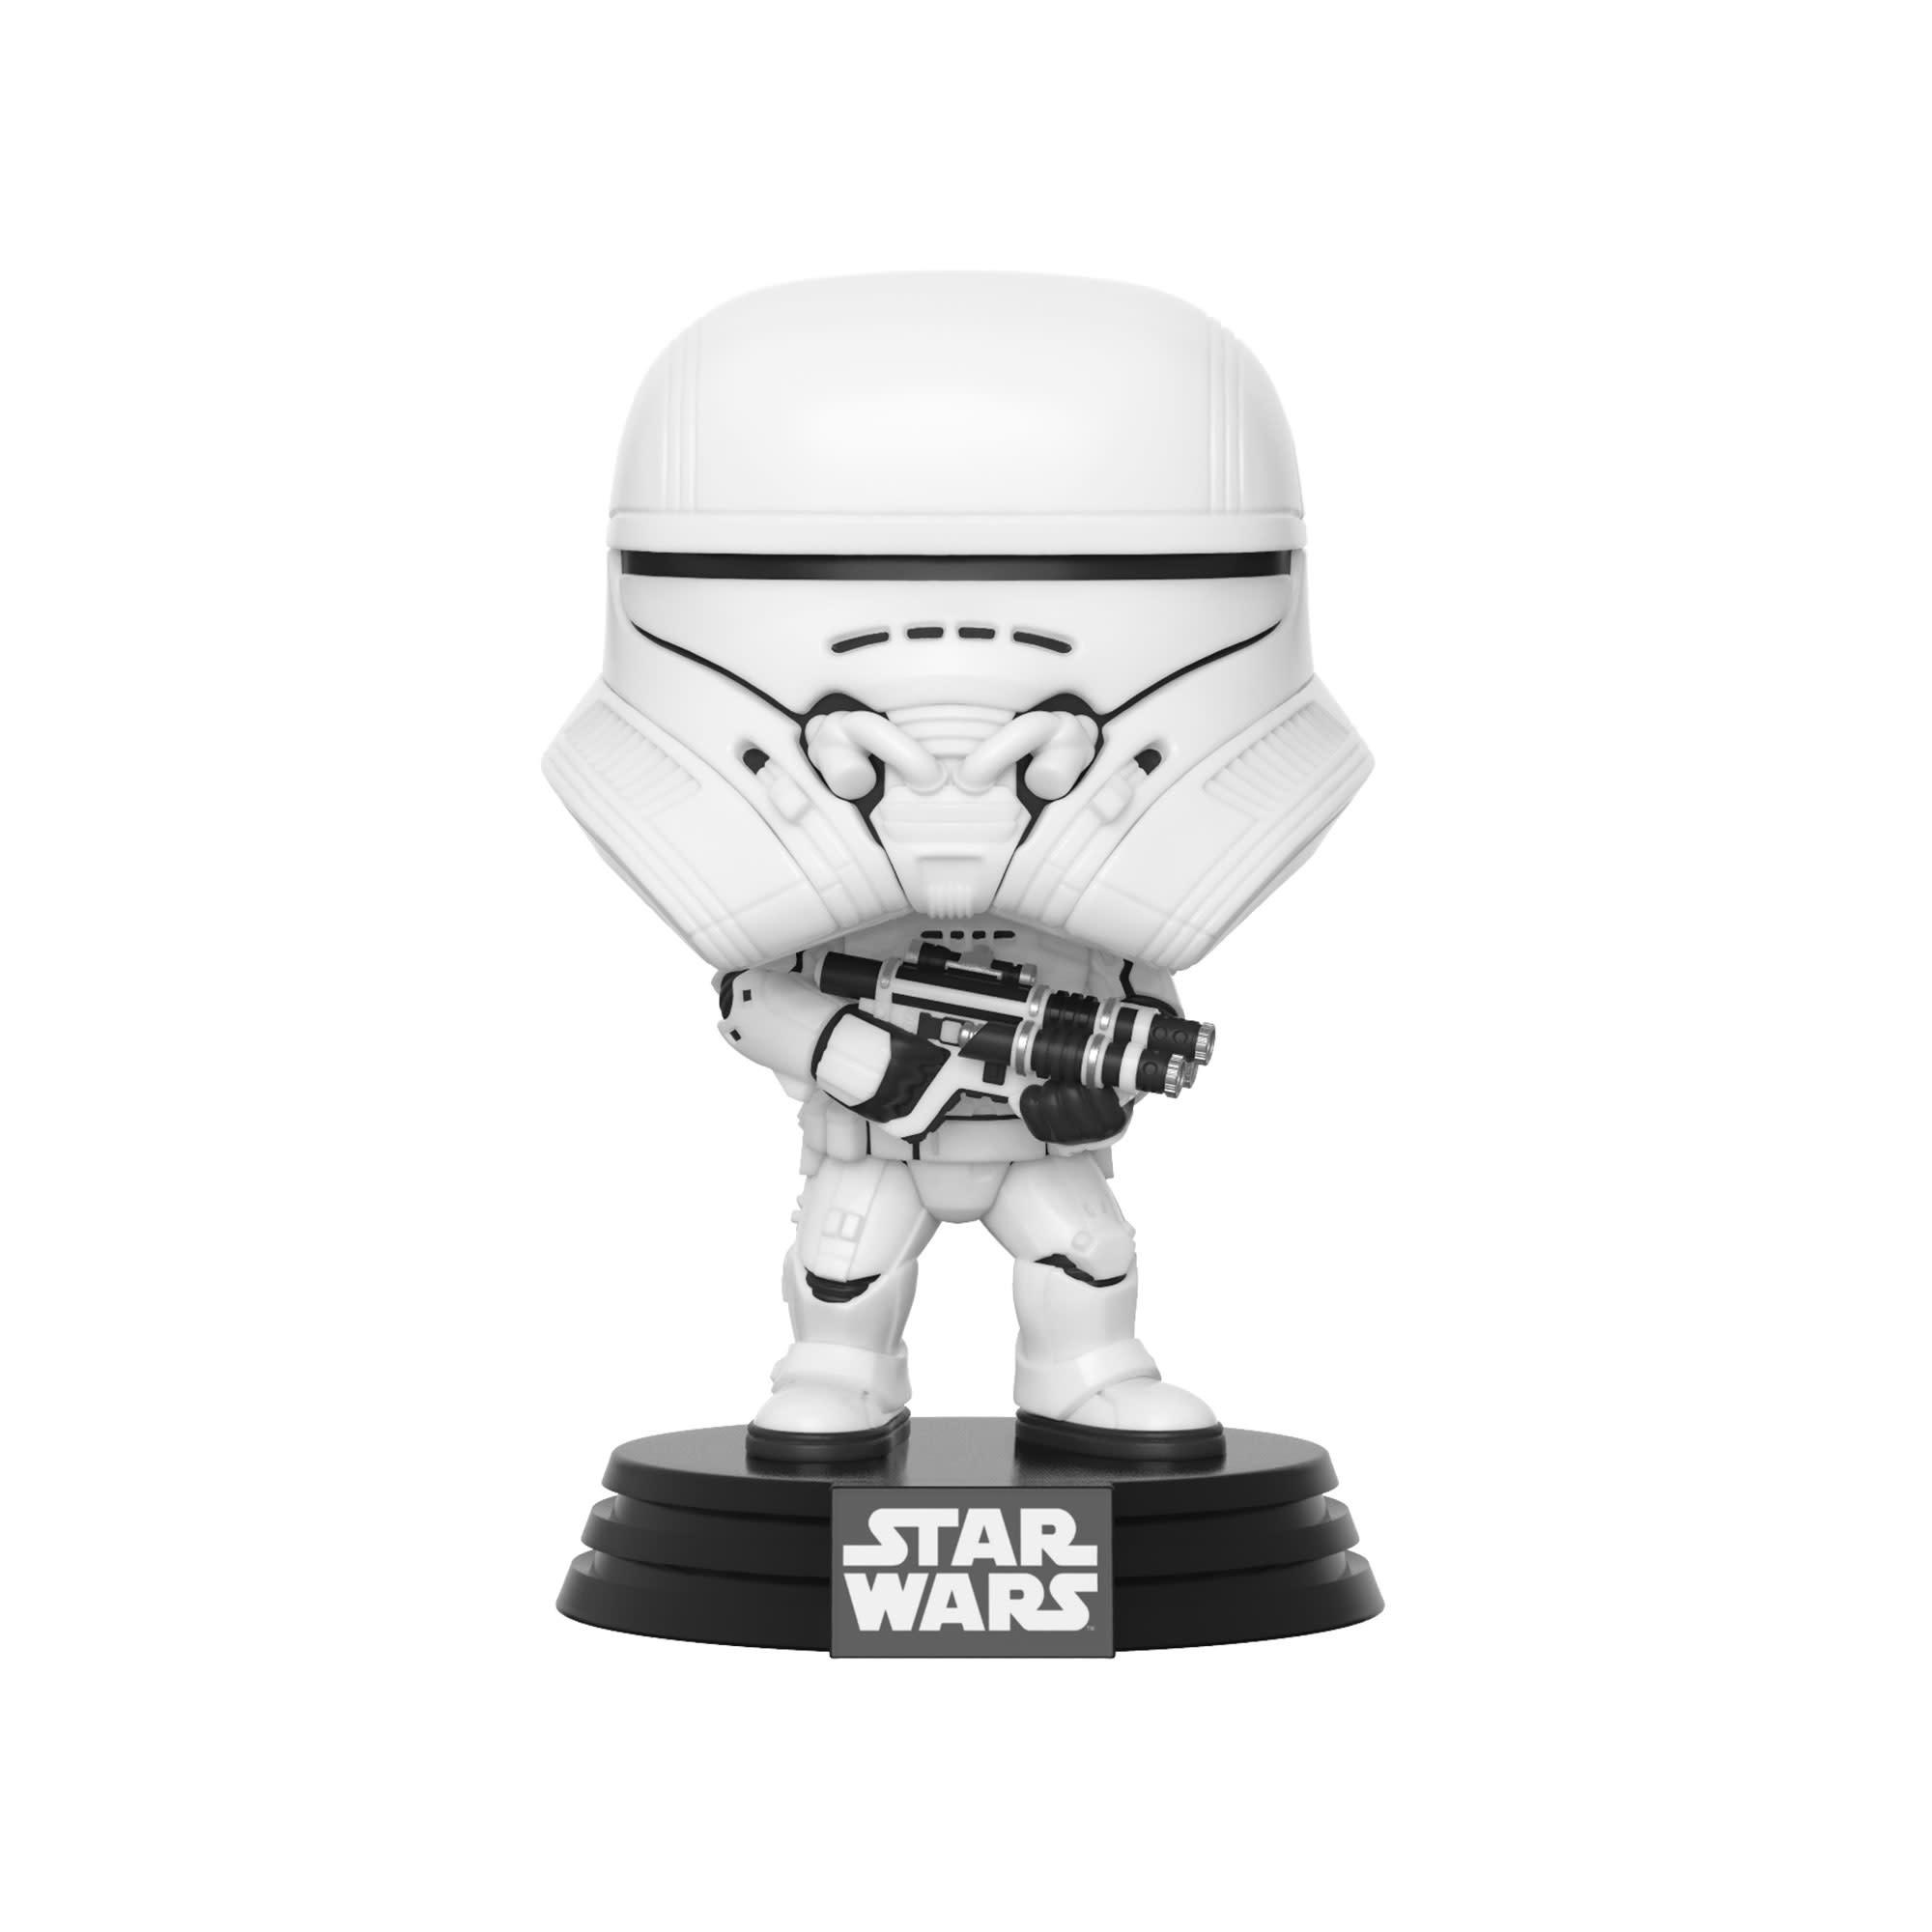 FUNKO Pop! Star Wars: The Rise of Skywalker - First Order Jet Trooper